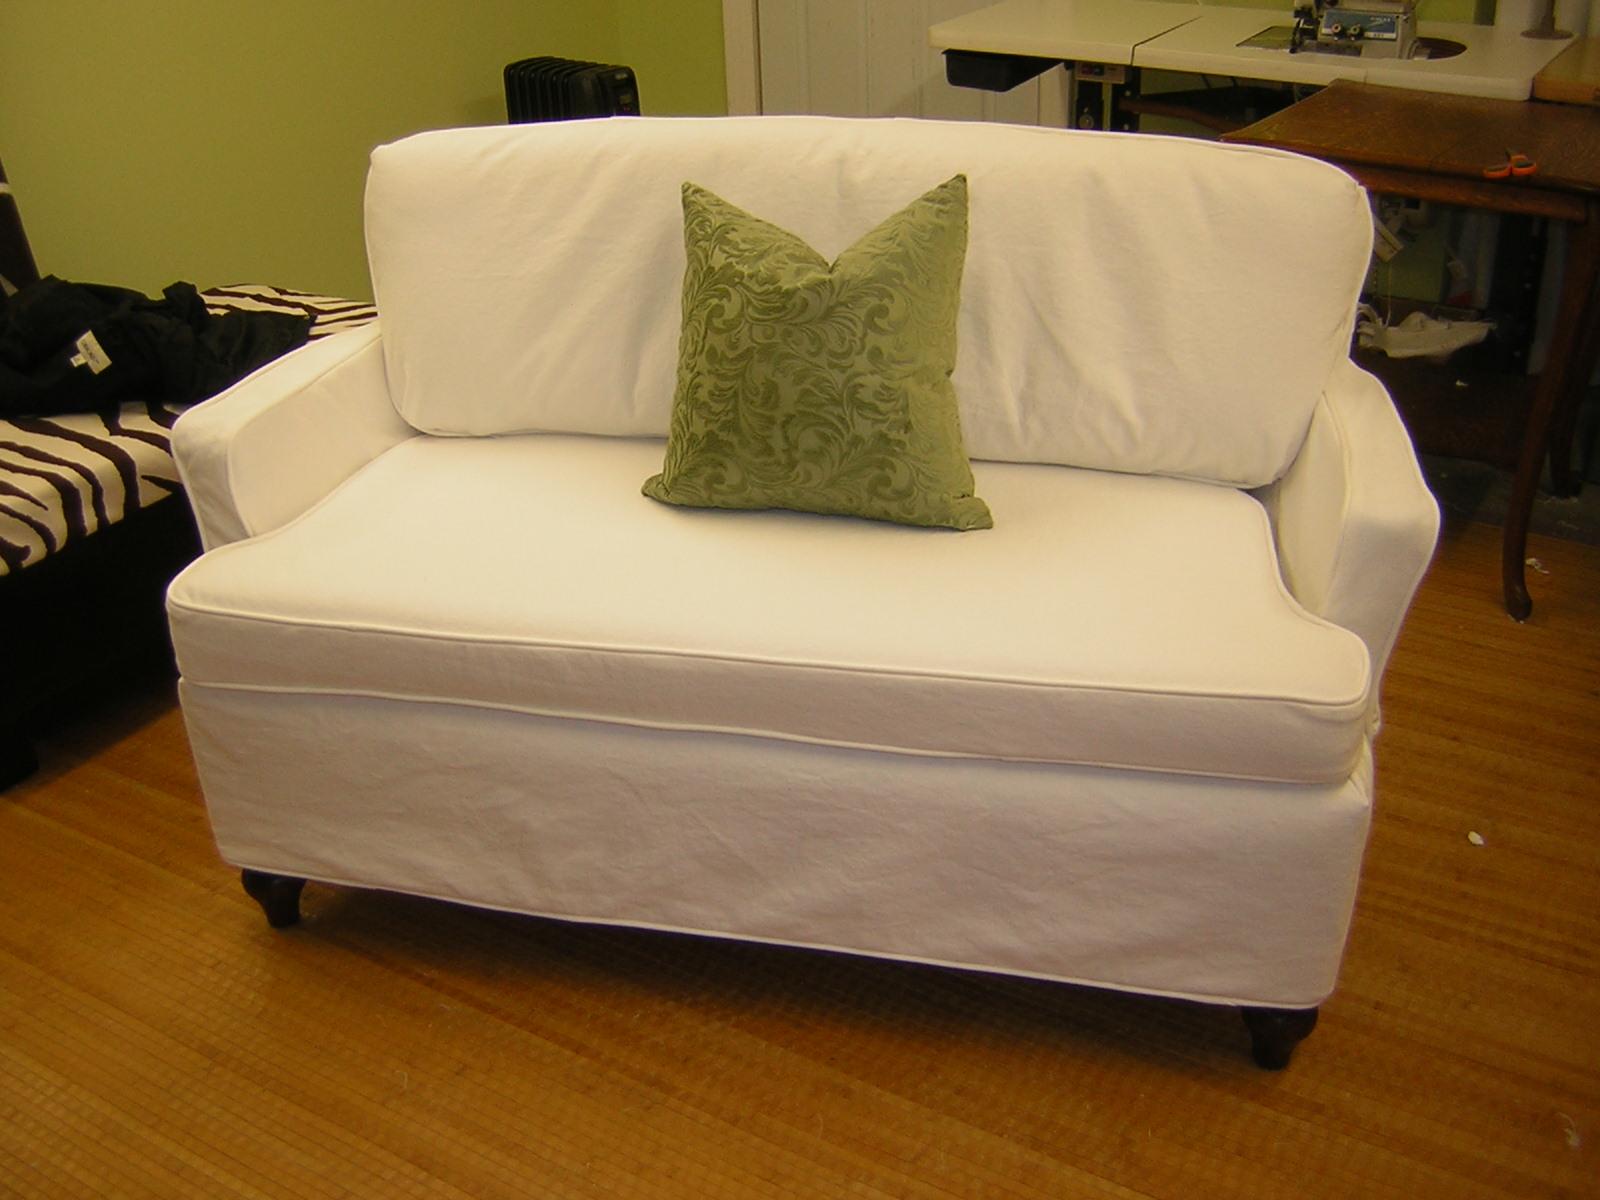 Slipcover Chic Redo of a Grandmothers Petite Sofa